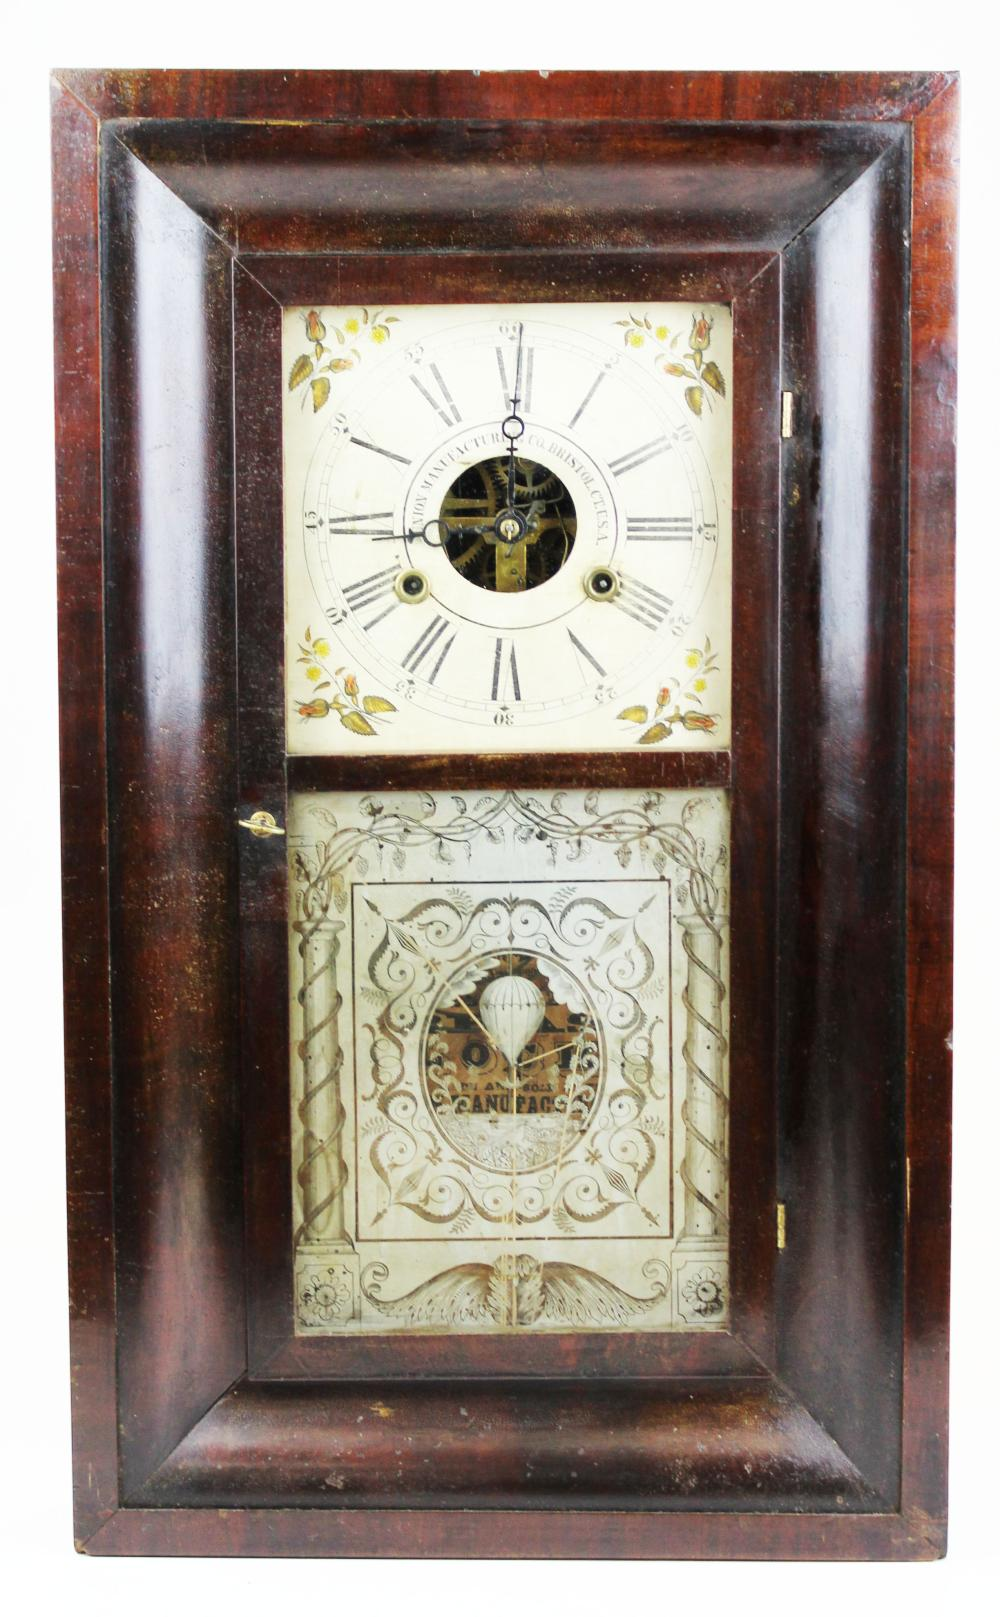 Union Mfg Co clock w/ hot air balloon belly door